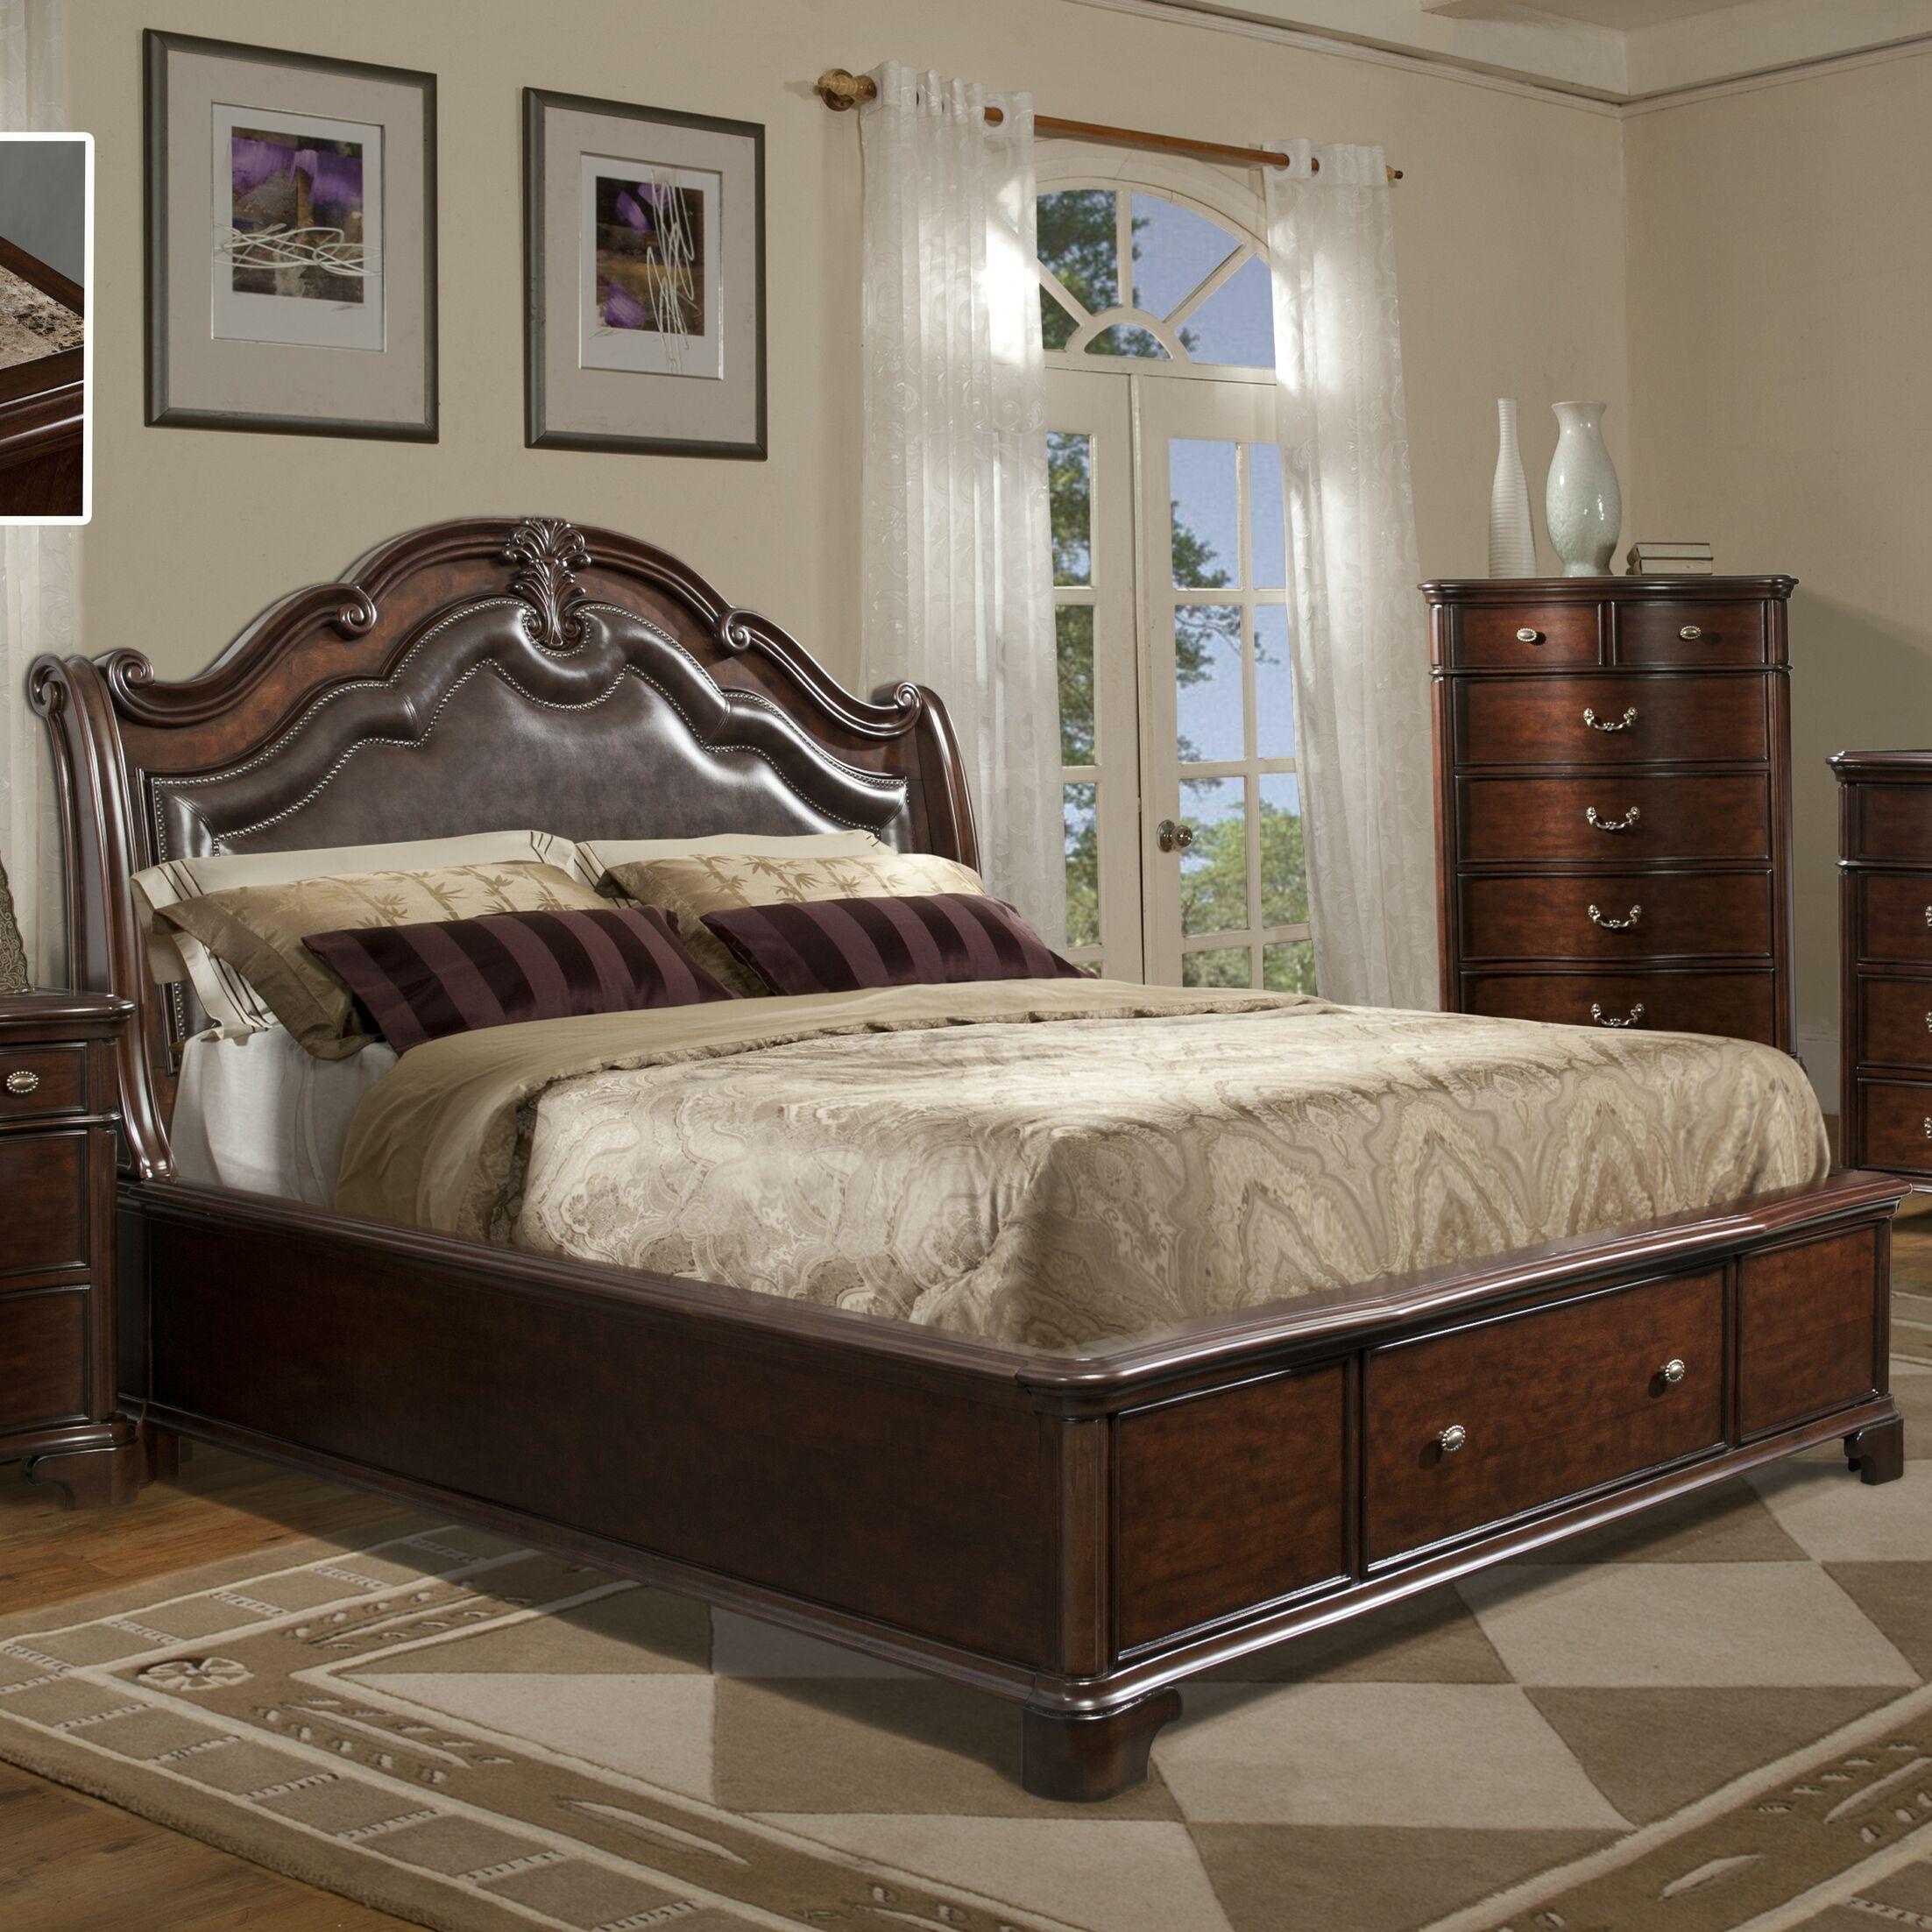 Alanya Upholstered Storage Platform Bed Size: Queen